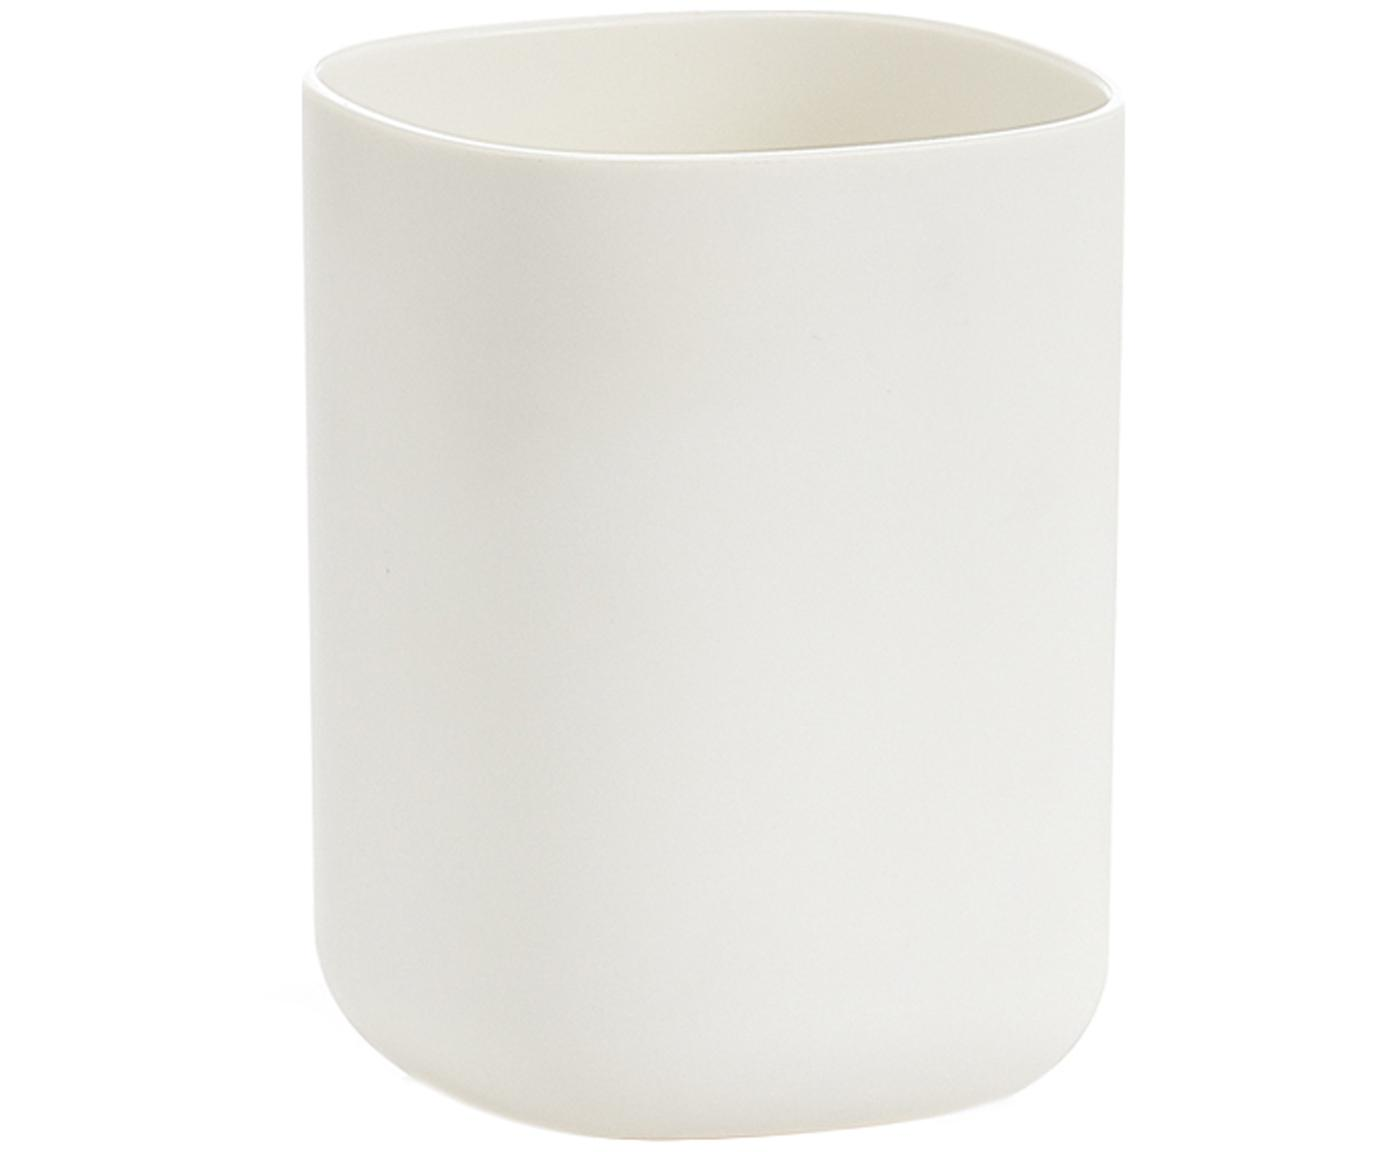 Porta spazzolini Caro, Materiale sintetico, Bianco, Larg. 7 x Alt. 10 cm